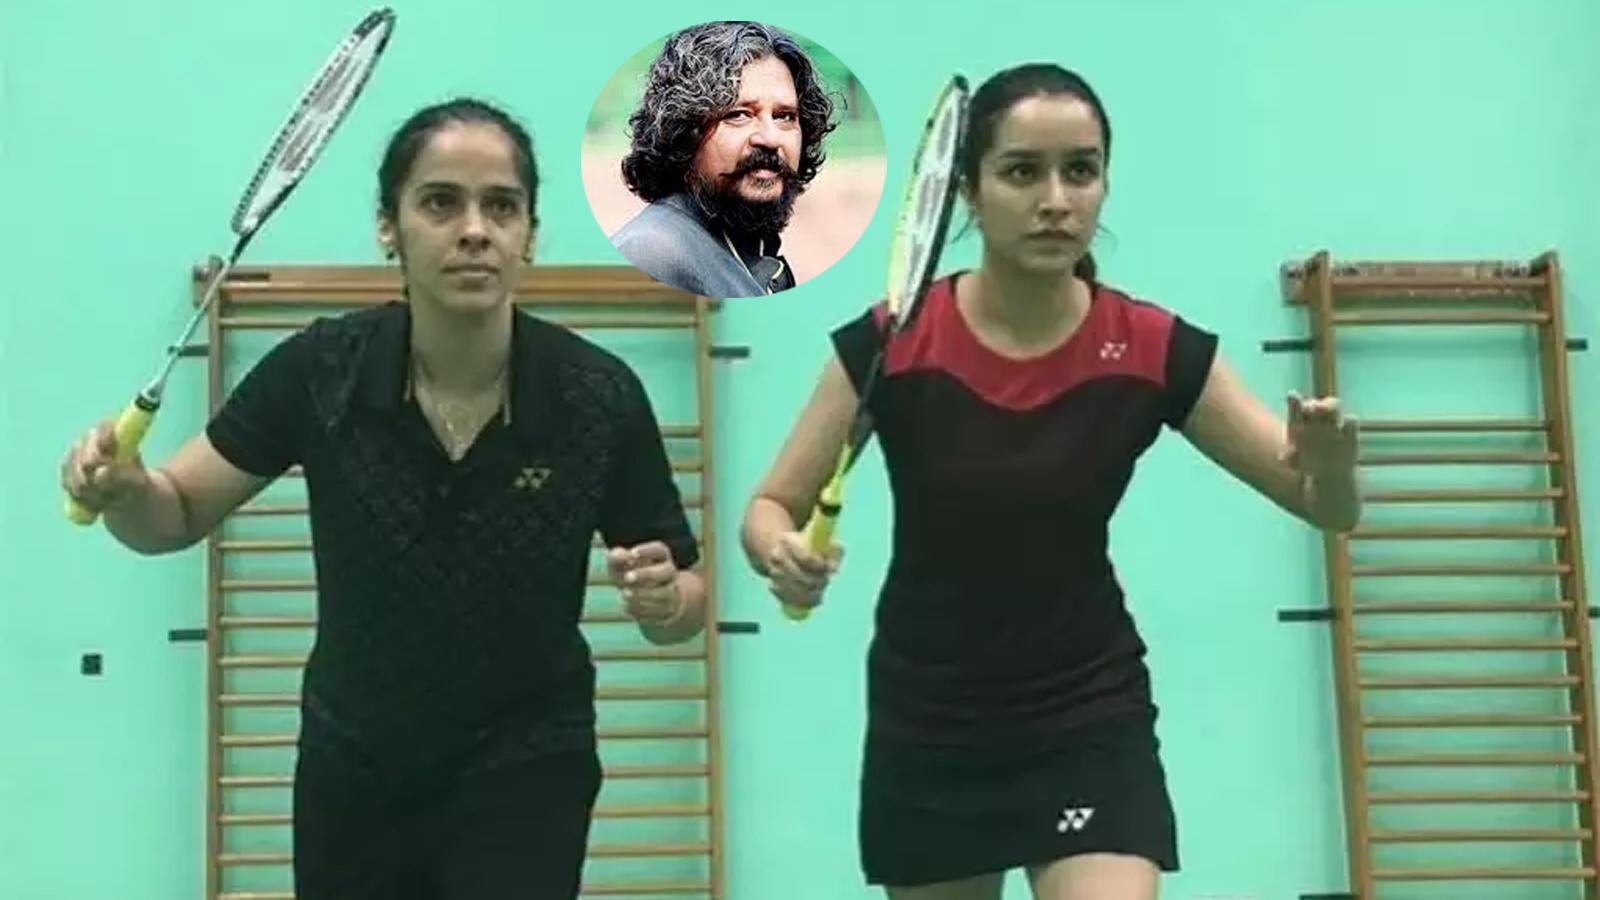 Is Amol Gupte upset with Shraddha Kapoor over Saina Nehwal biopic?